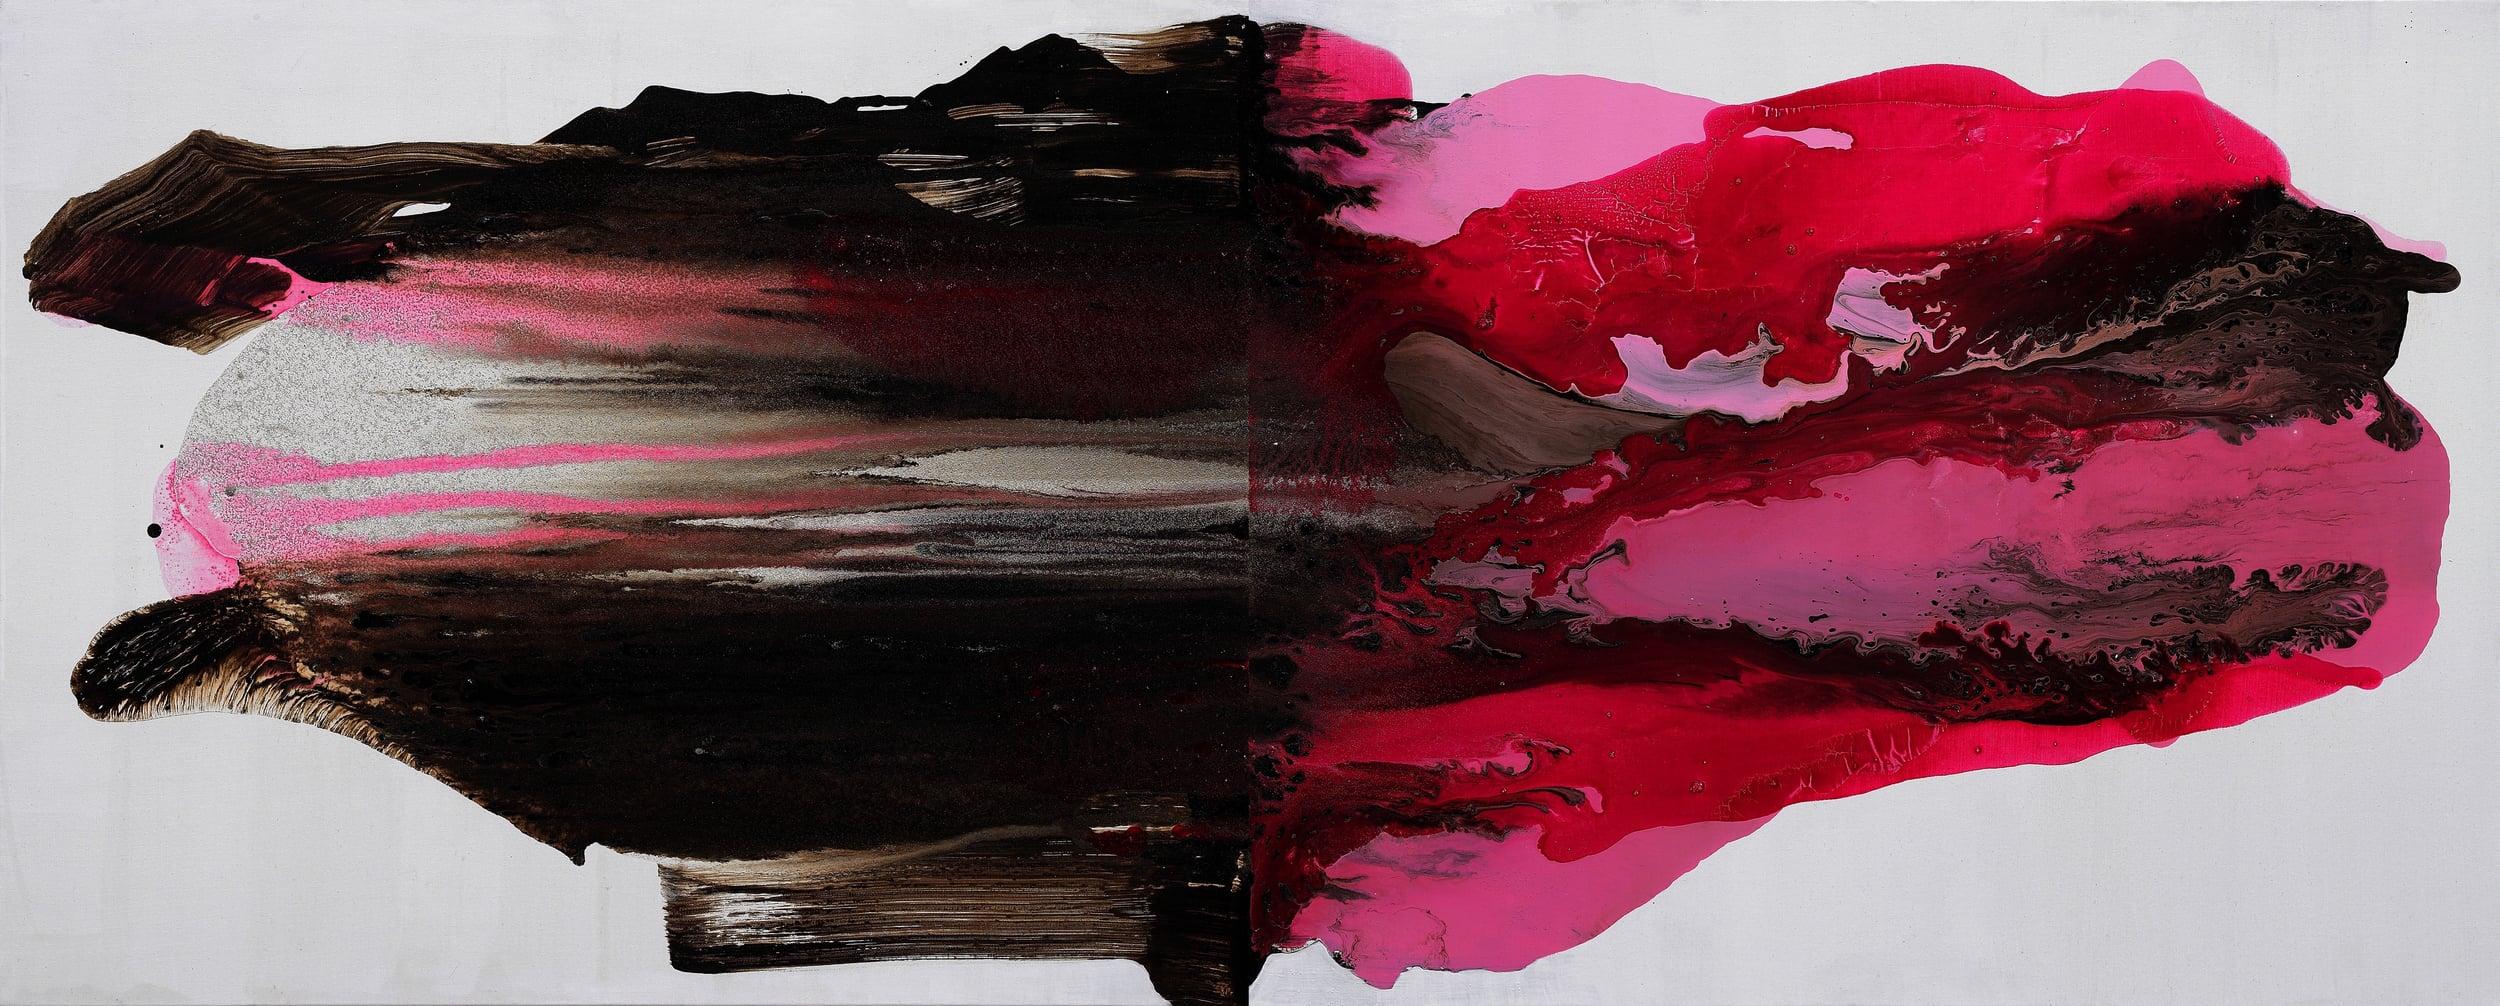 figure_18  acrylic and pumice  gel on canvas  181.8 cm X 72 cm  2014